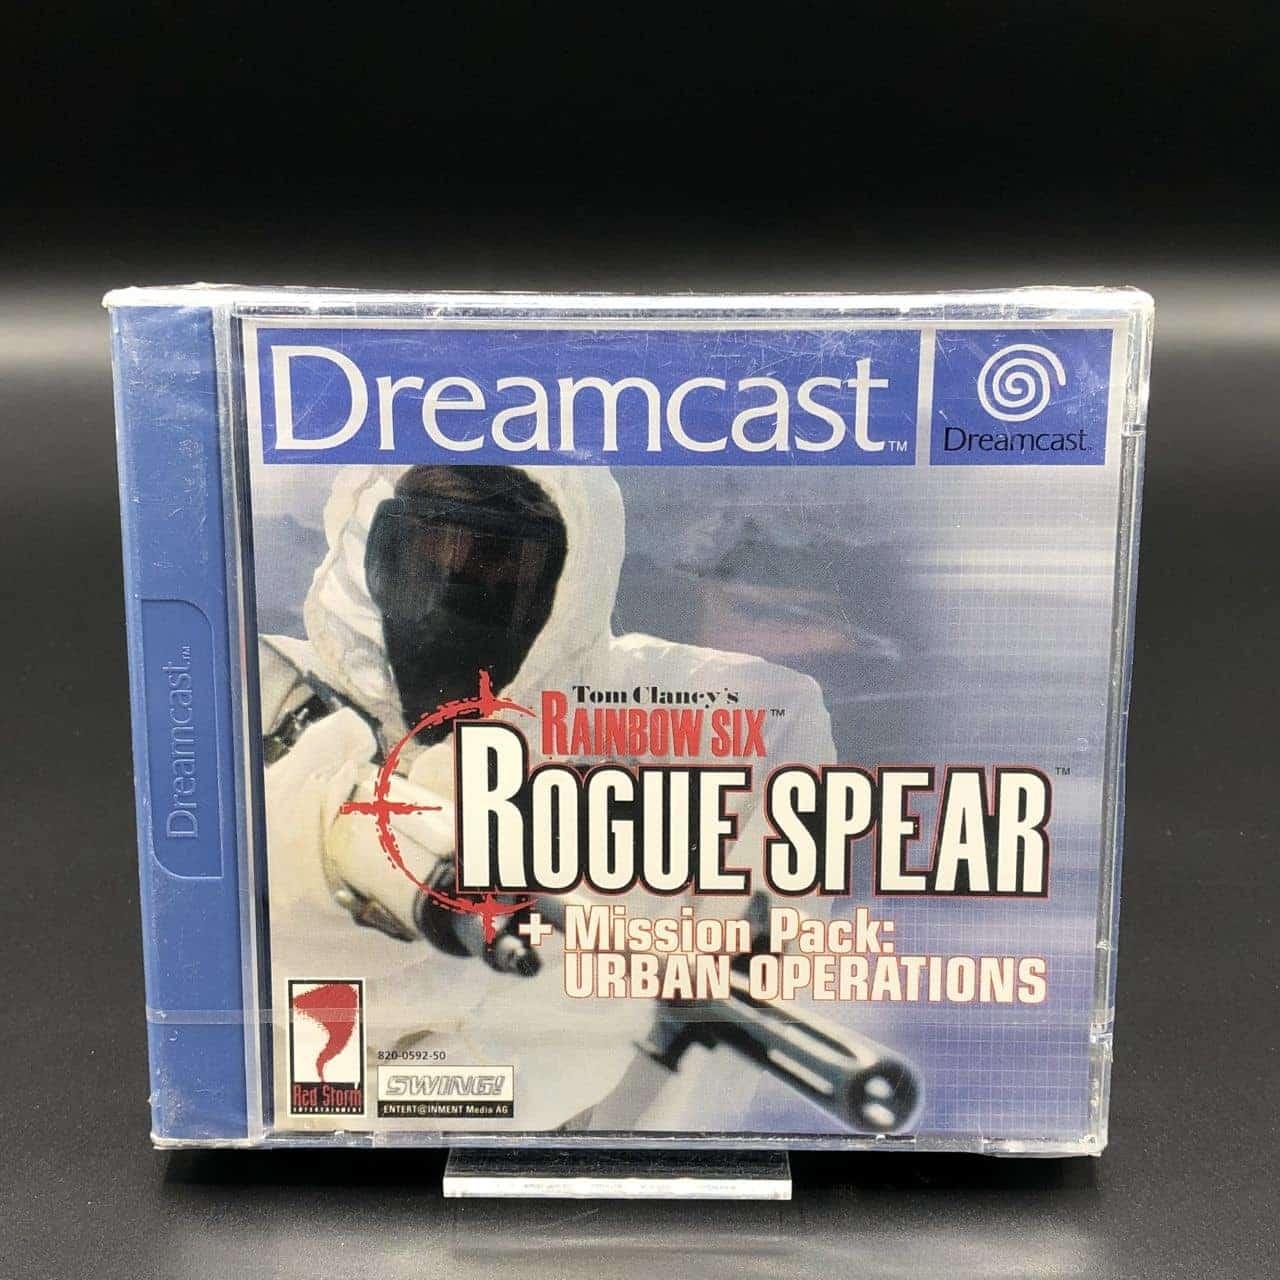 Tom Clancy's Rainbow Six: Rogue Spear + Mission Pack: Urban Operations (NEU) Sega Dreamcast